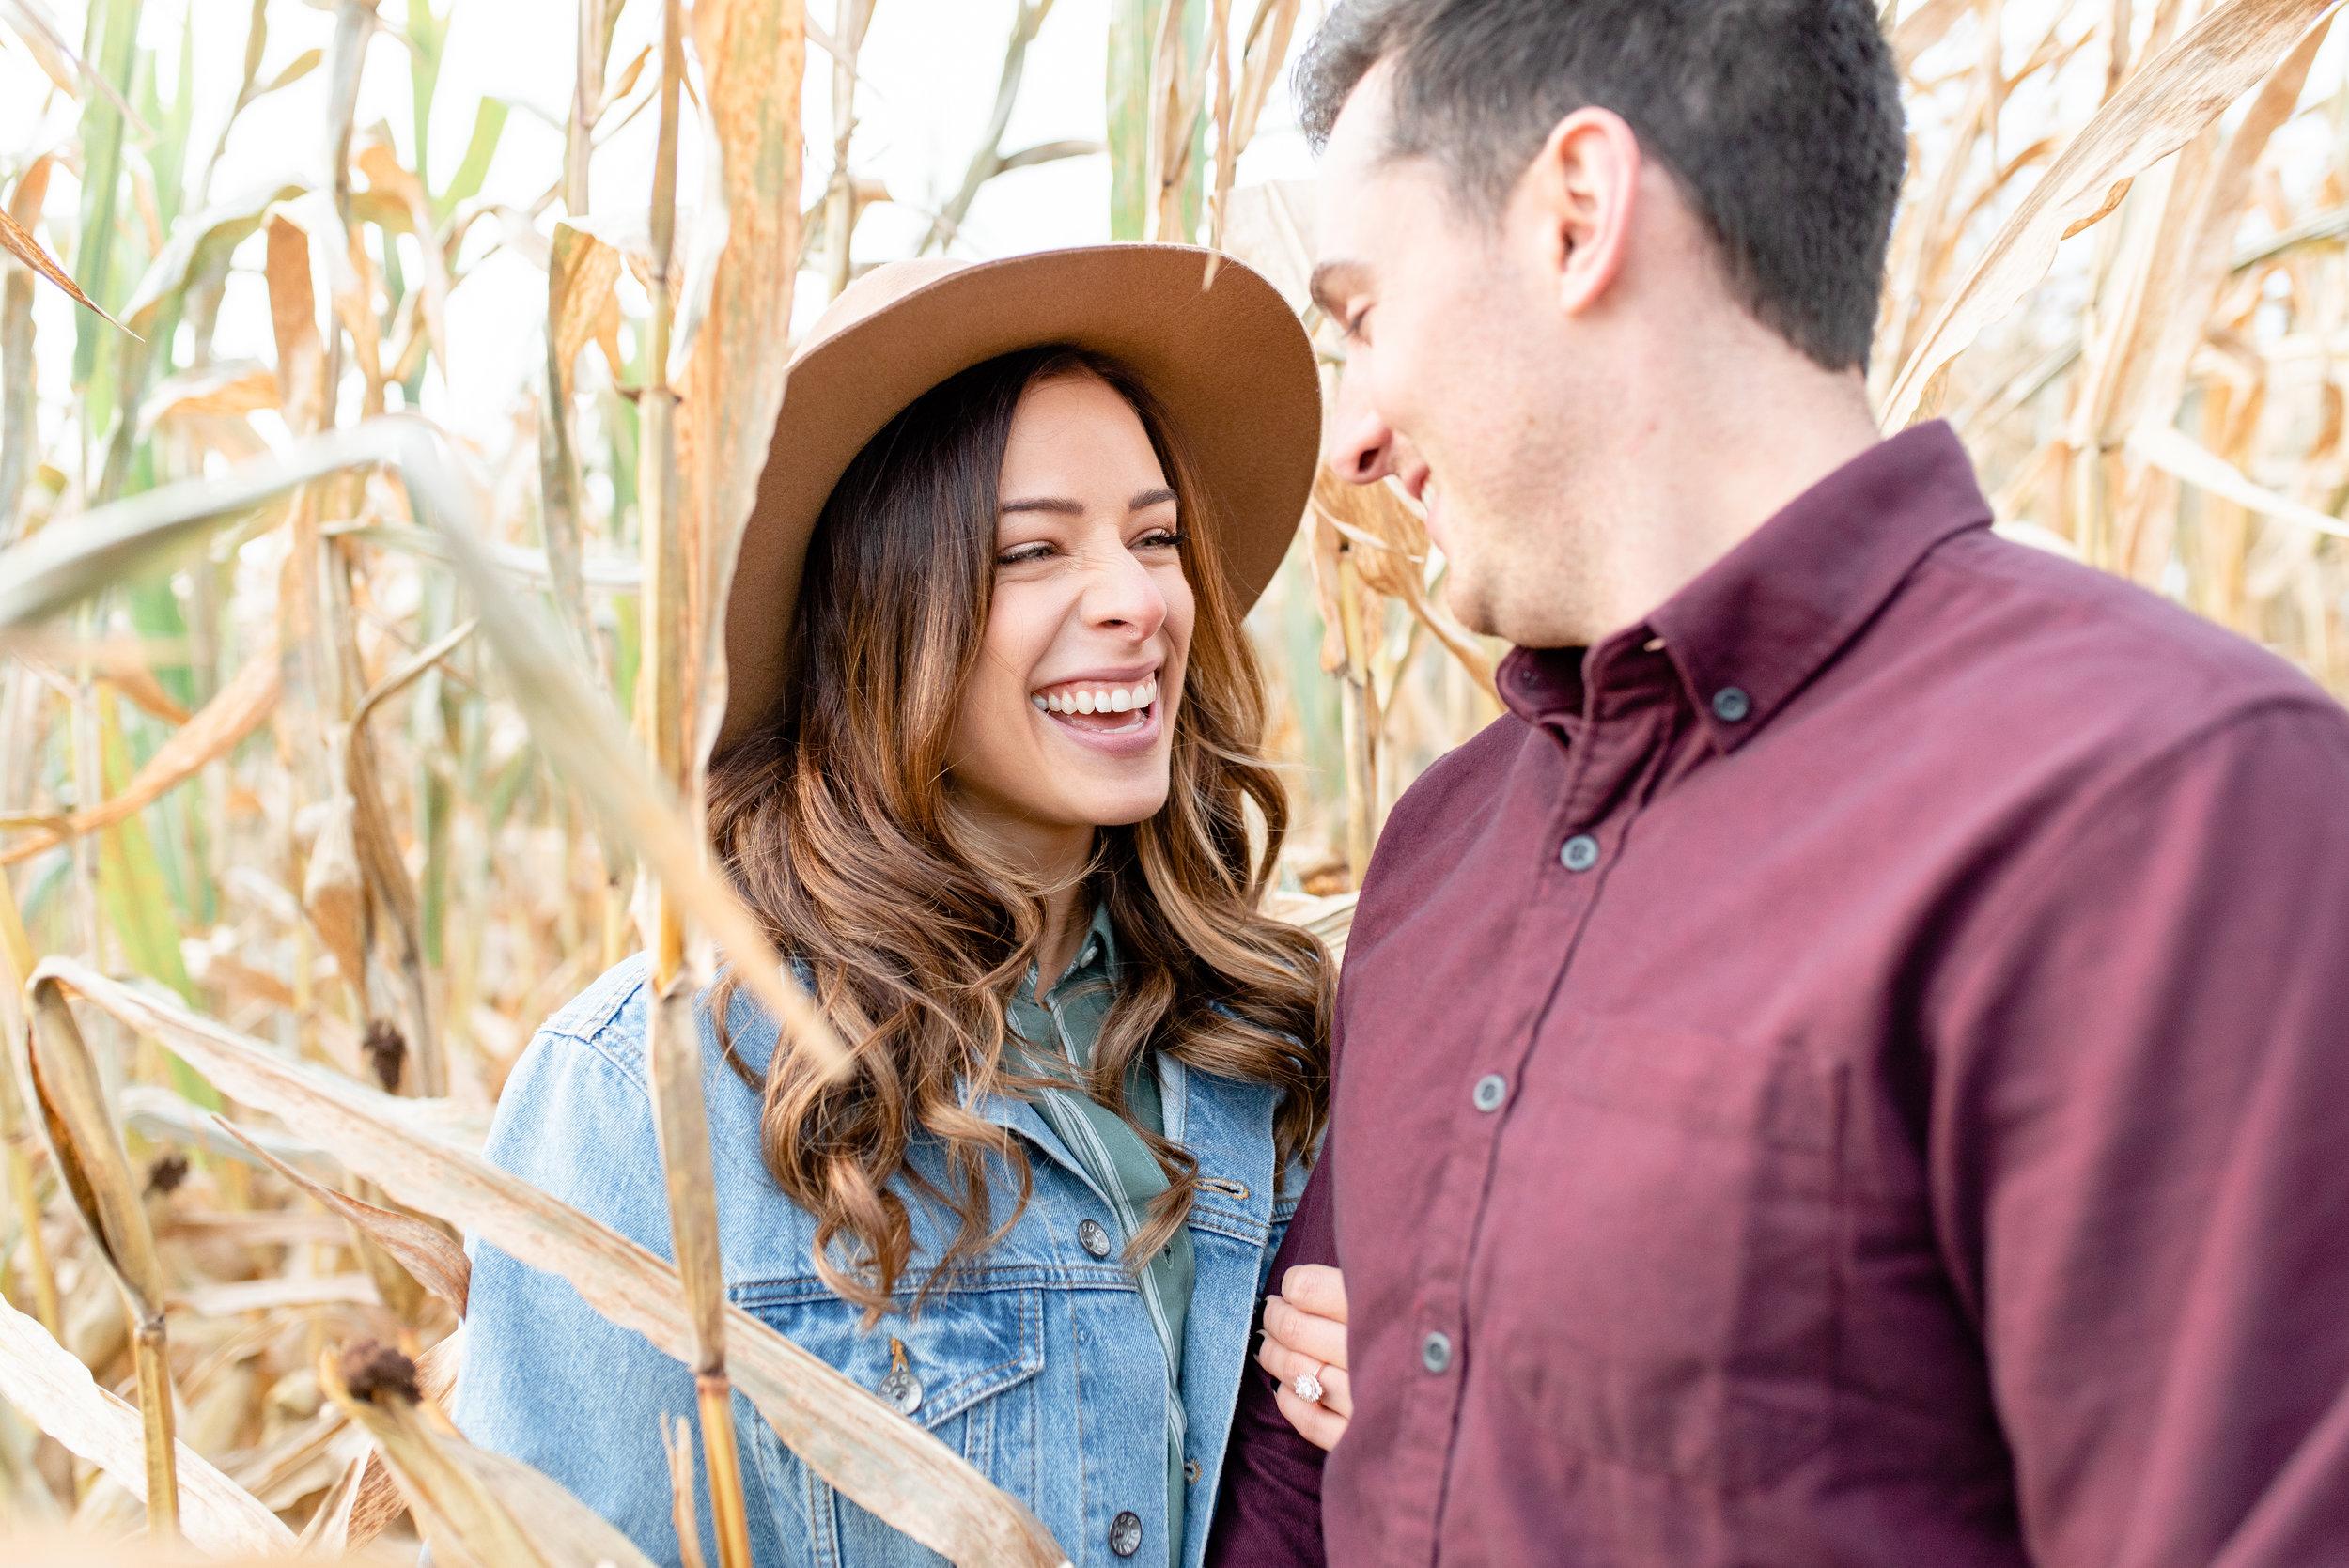 10_19_2018_Dana_Slifer_Photography_Brittany_and_Kevin_Engagement_Session_HR_PRINT_127.jpg